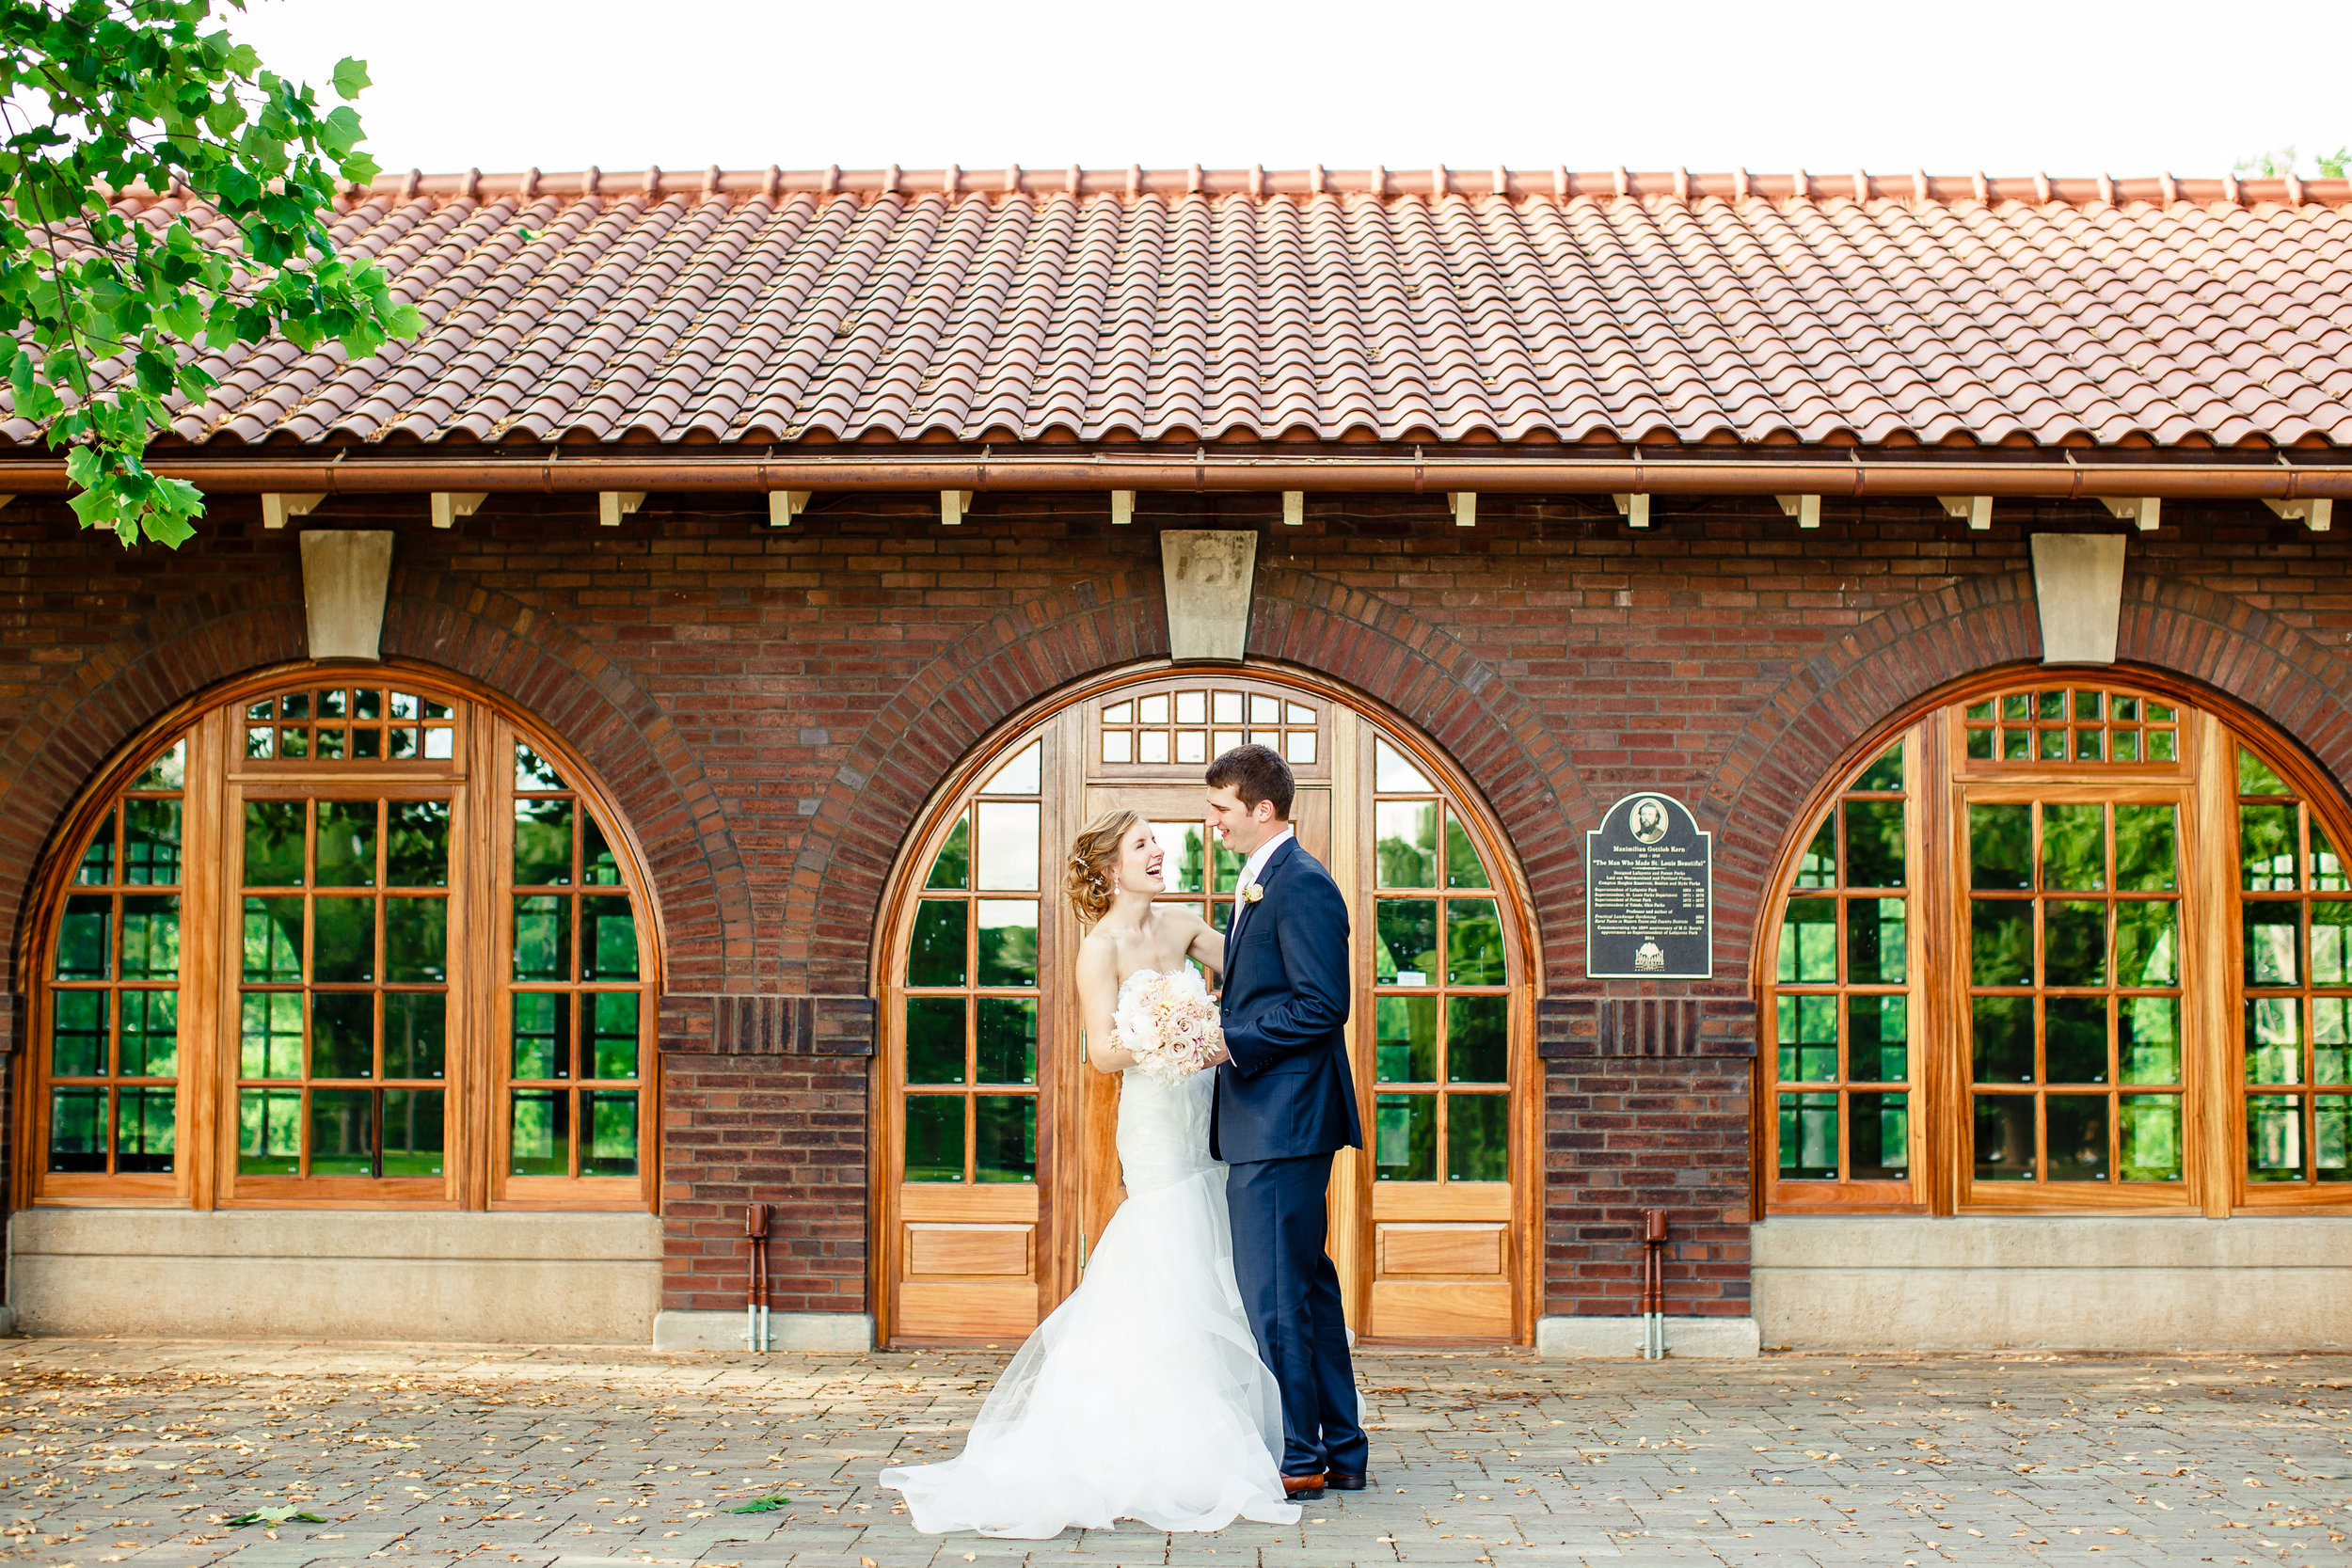 Lafayette Square Park St. Louis Wedding Photographer Oldani Photography 7.jpg